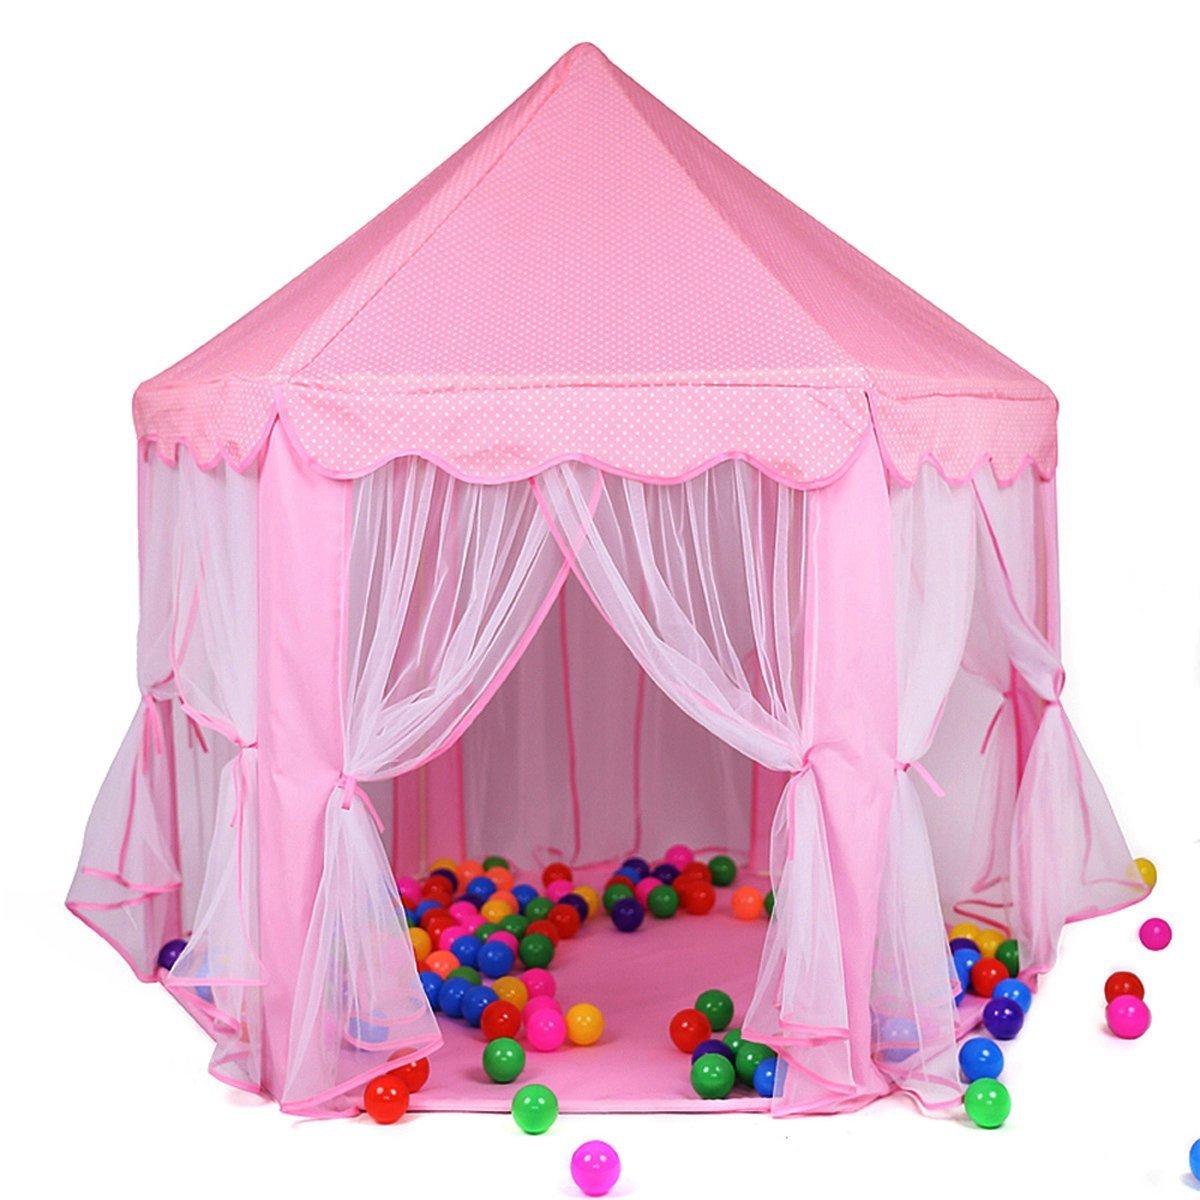 Dalosdream Prinzessin Baby Zimmer Kinder Zelt Burg Spielzelt ...